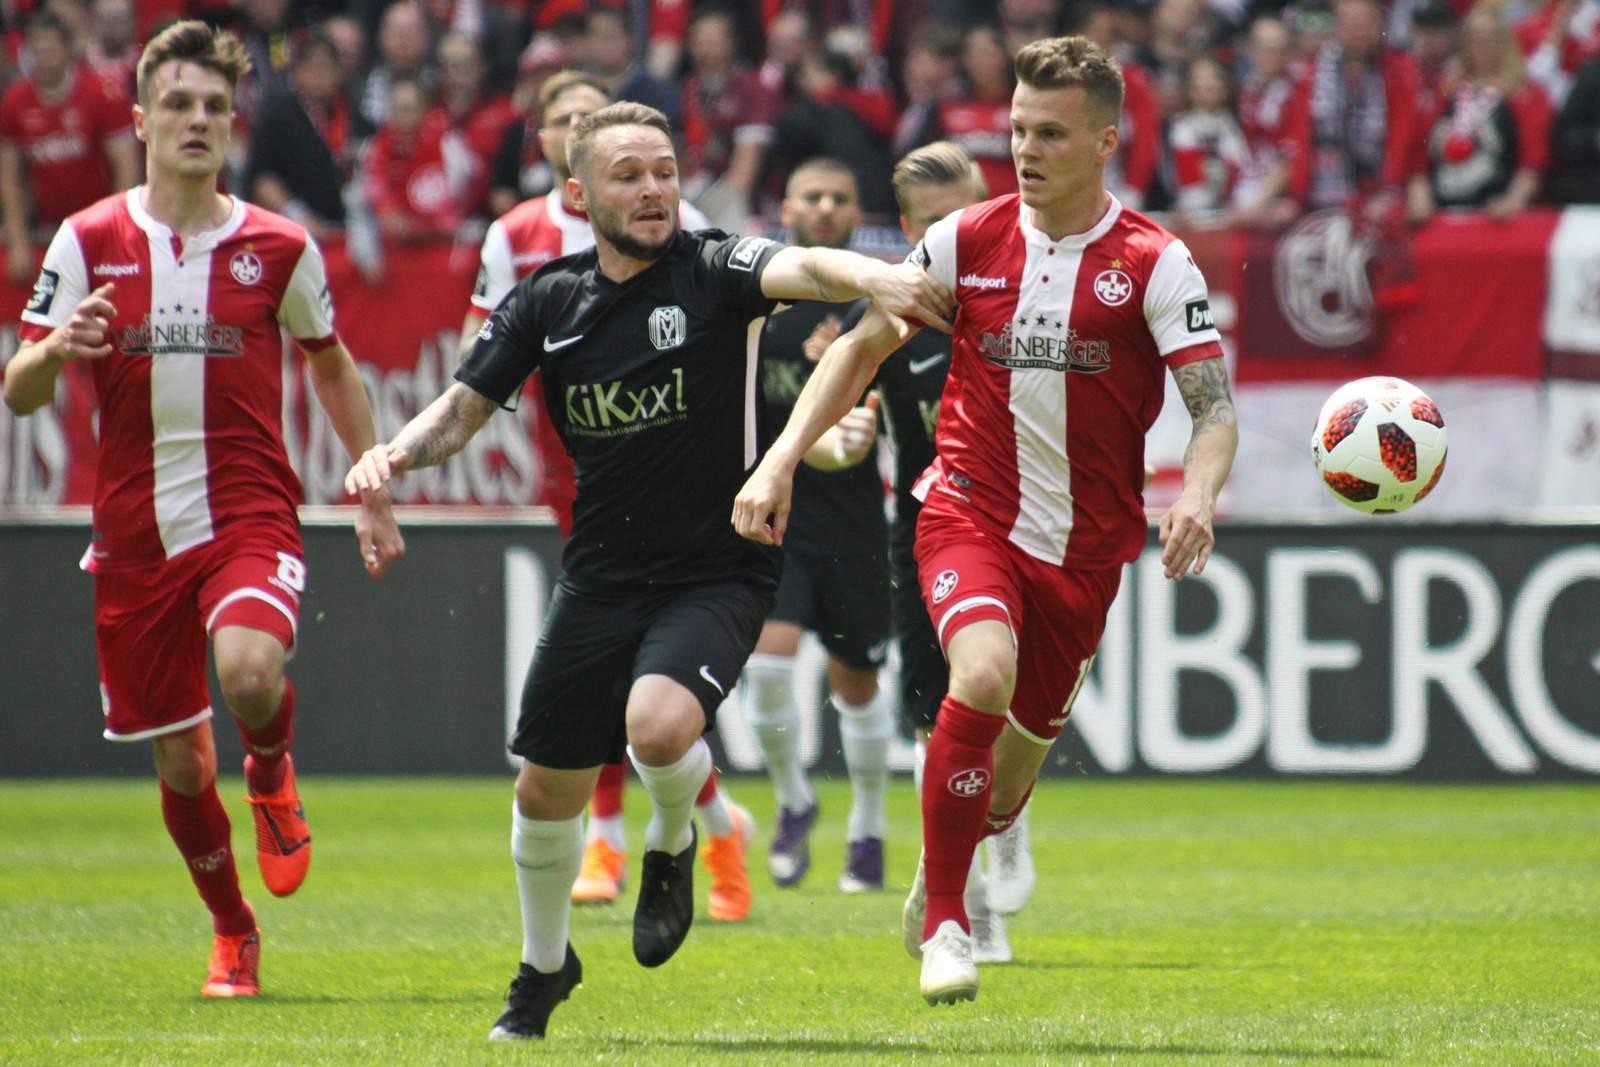 Marius Kleinsorge gegen Florian Pick.